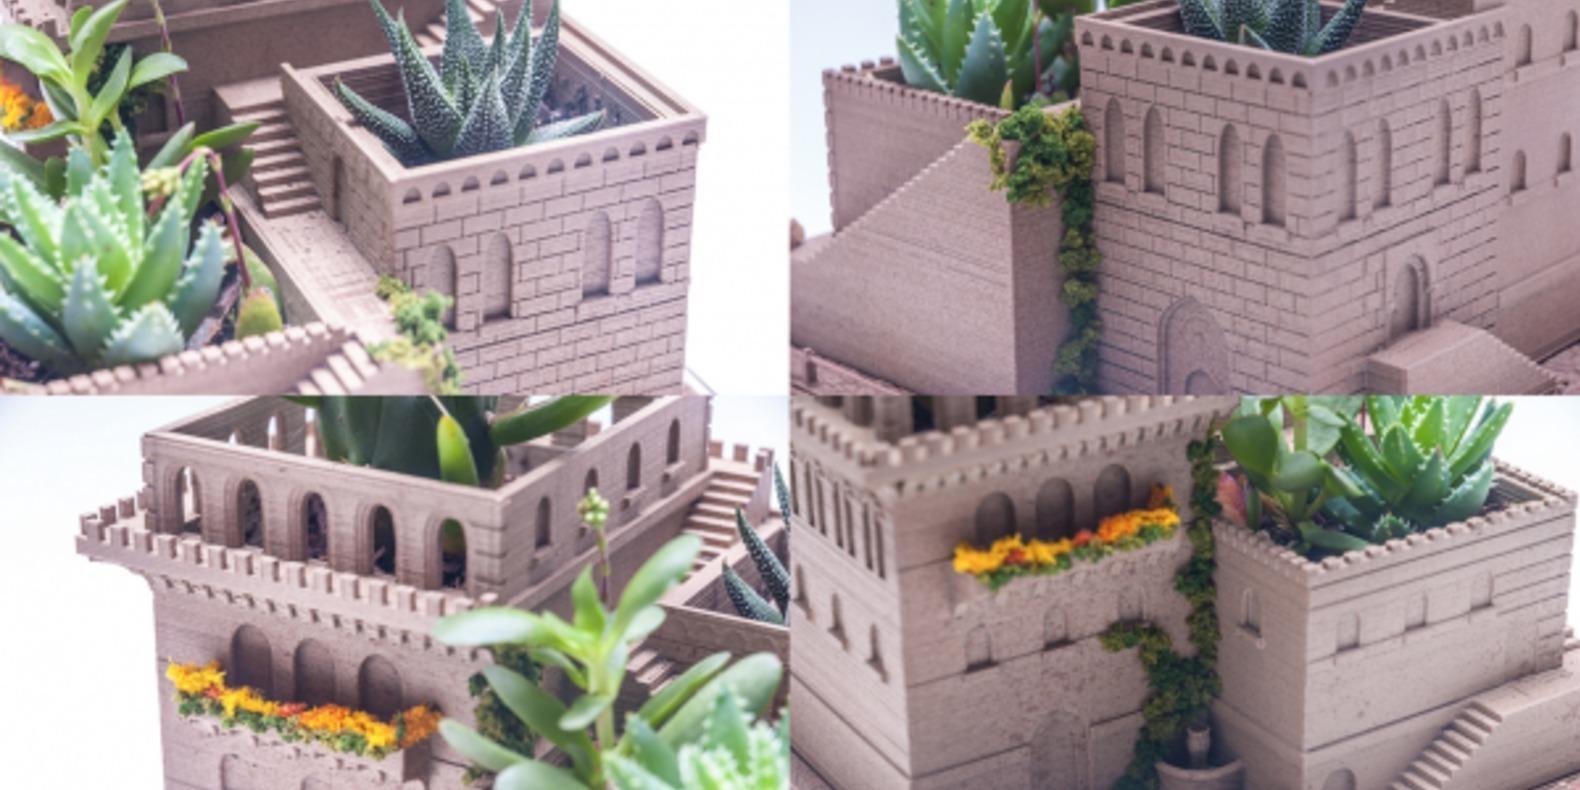 http://fichier3d.fr/wp-content/uploads/2016/08/YURIYSKLYAR-planter-tinkercad-makerbot-fichier-3D-cults-3.png